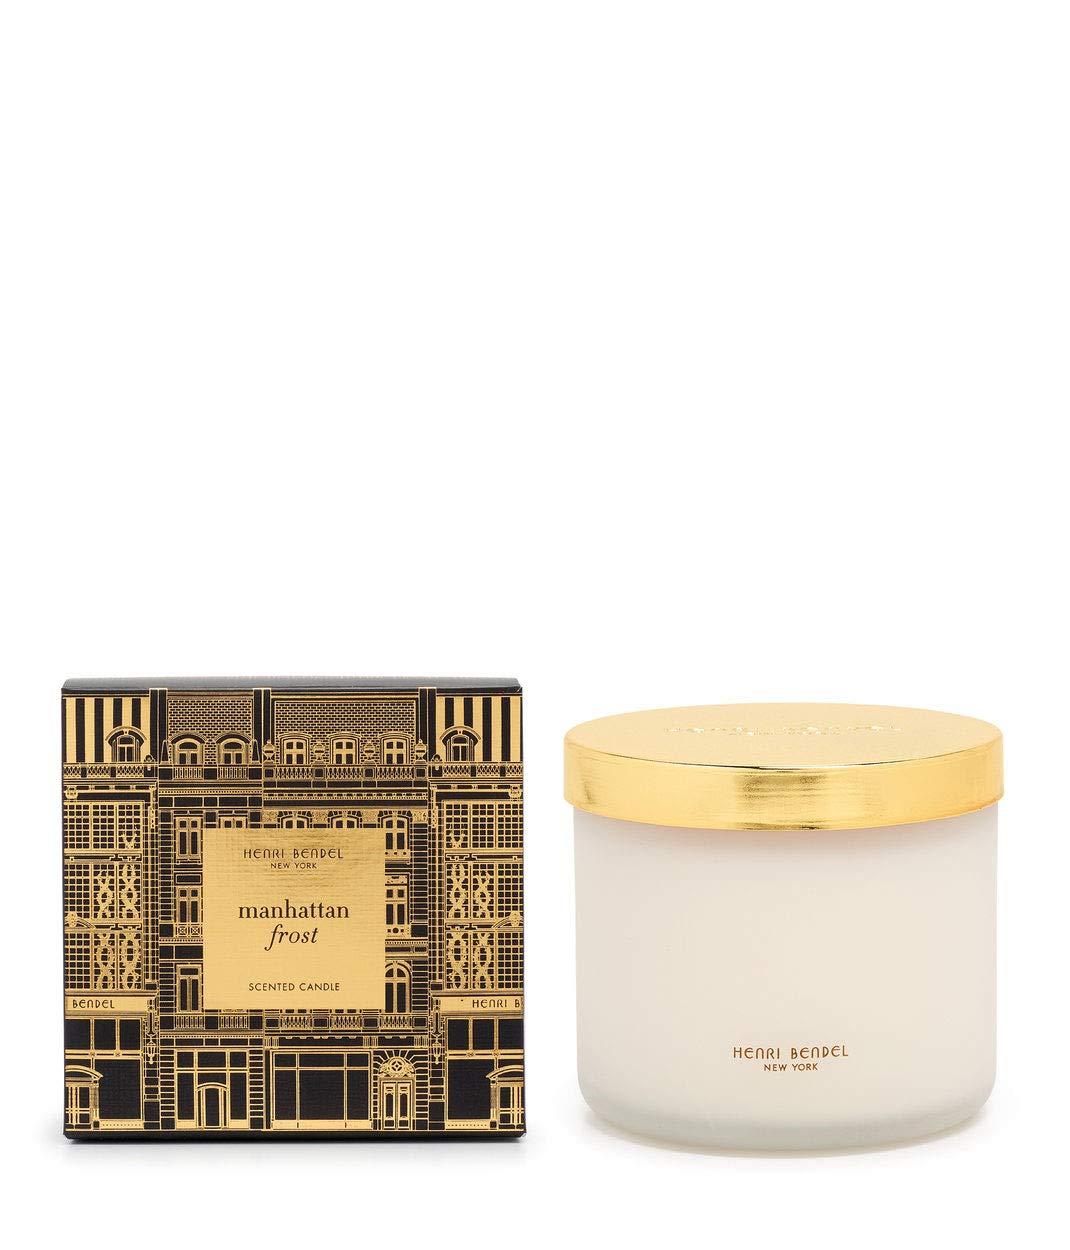 Henri Bendel Manhattan Frost 14.5オンス 3本芯キャンドル 香り付きキャンドル   B07MDLLWTM